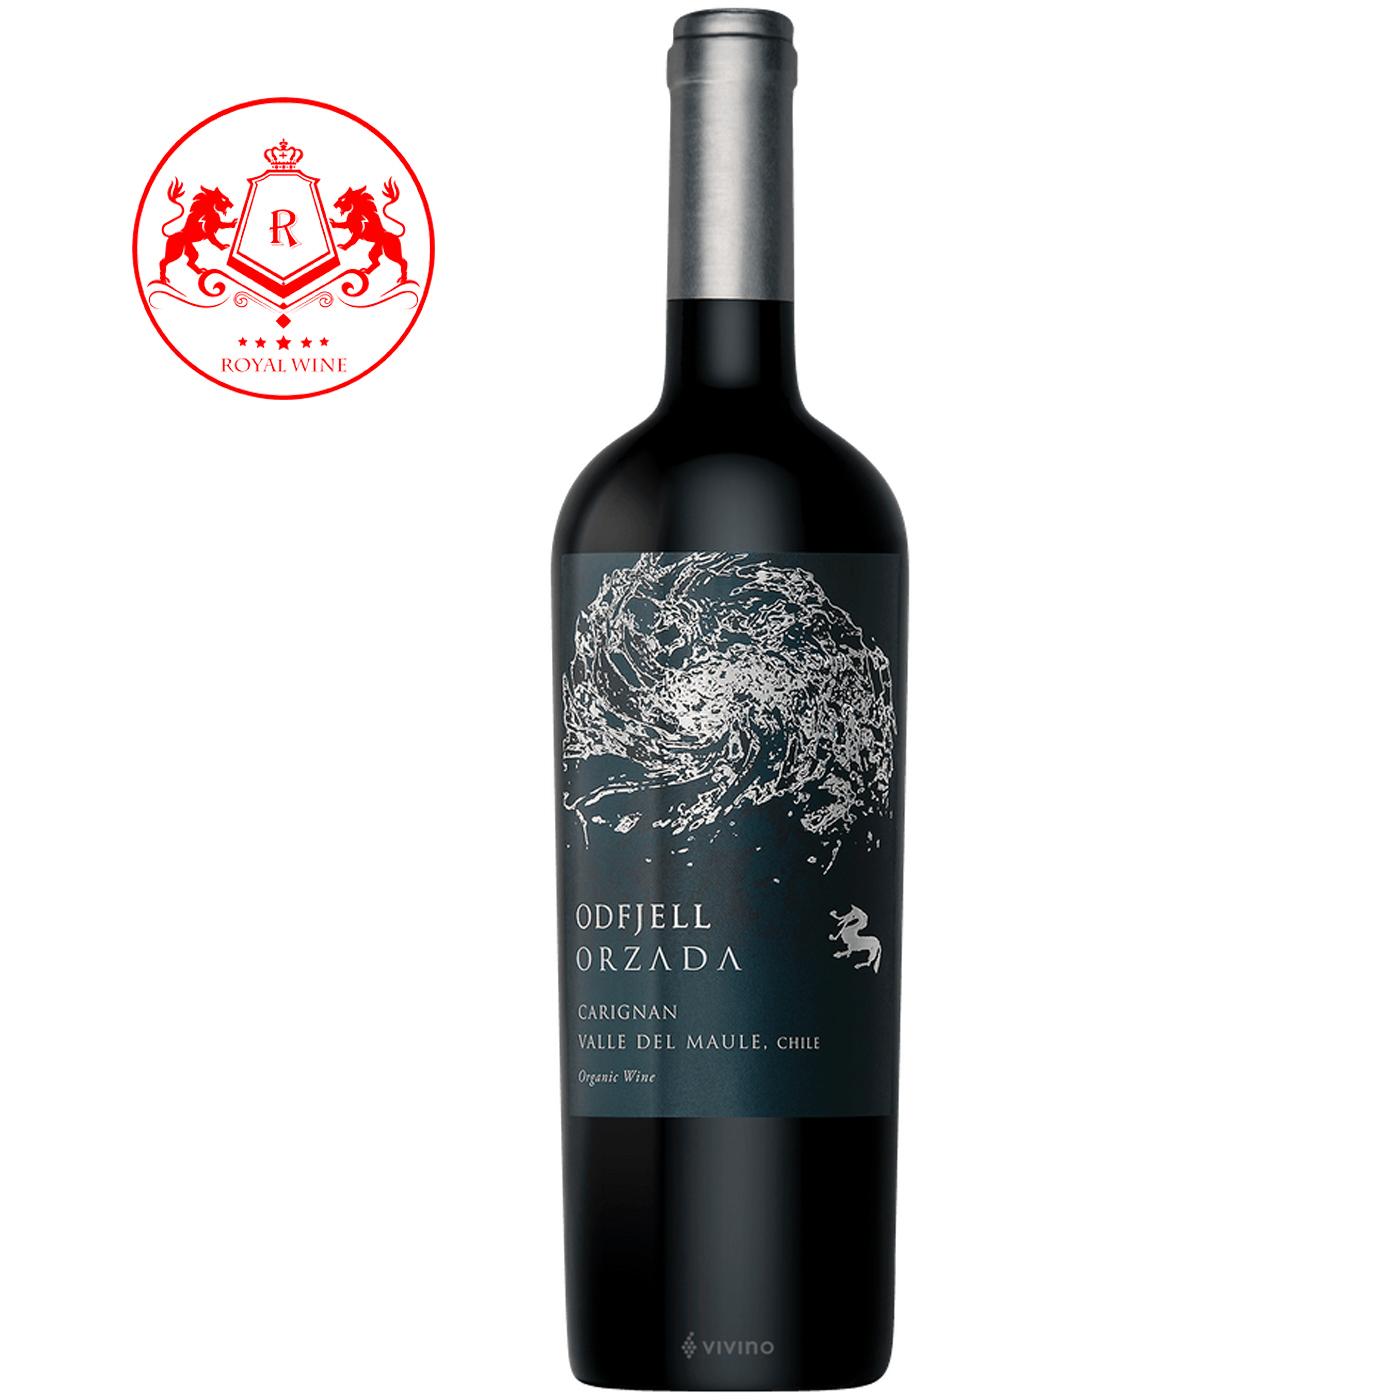 Rượu vang ODFJELL ORZADA Cariganan